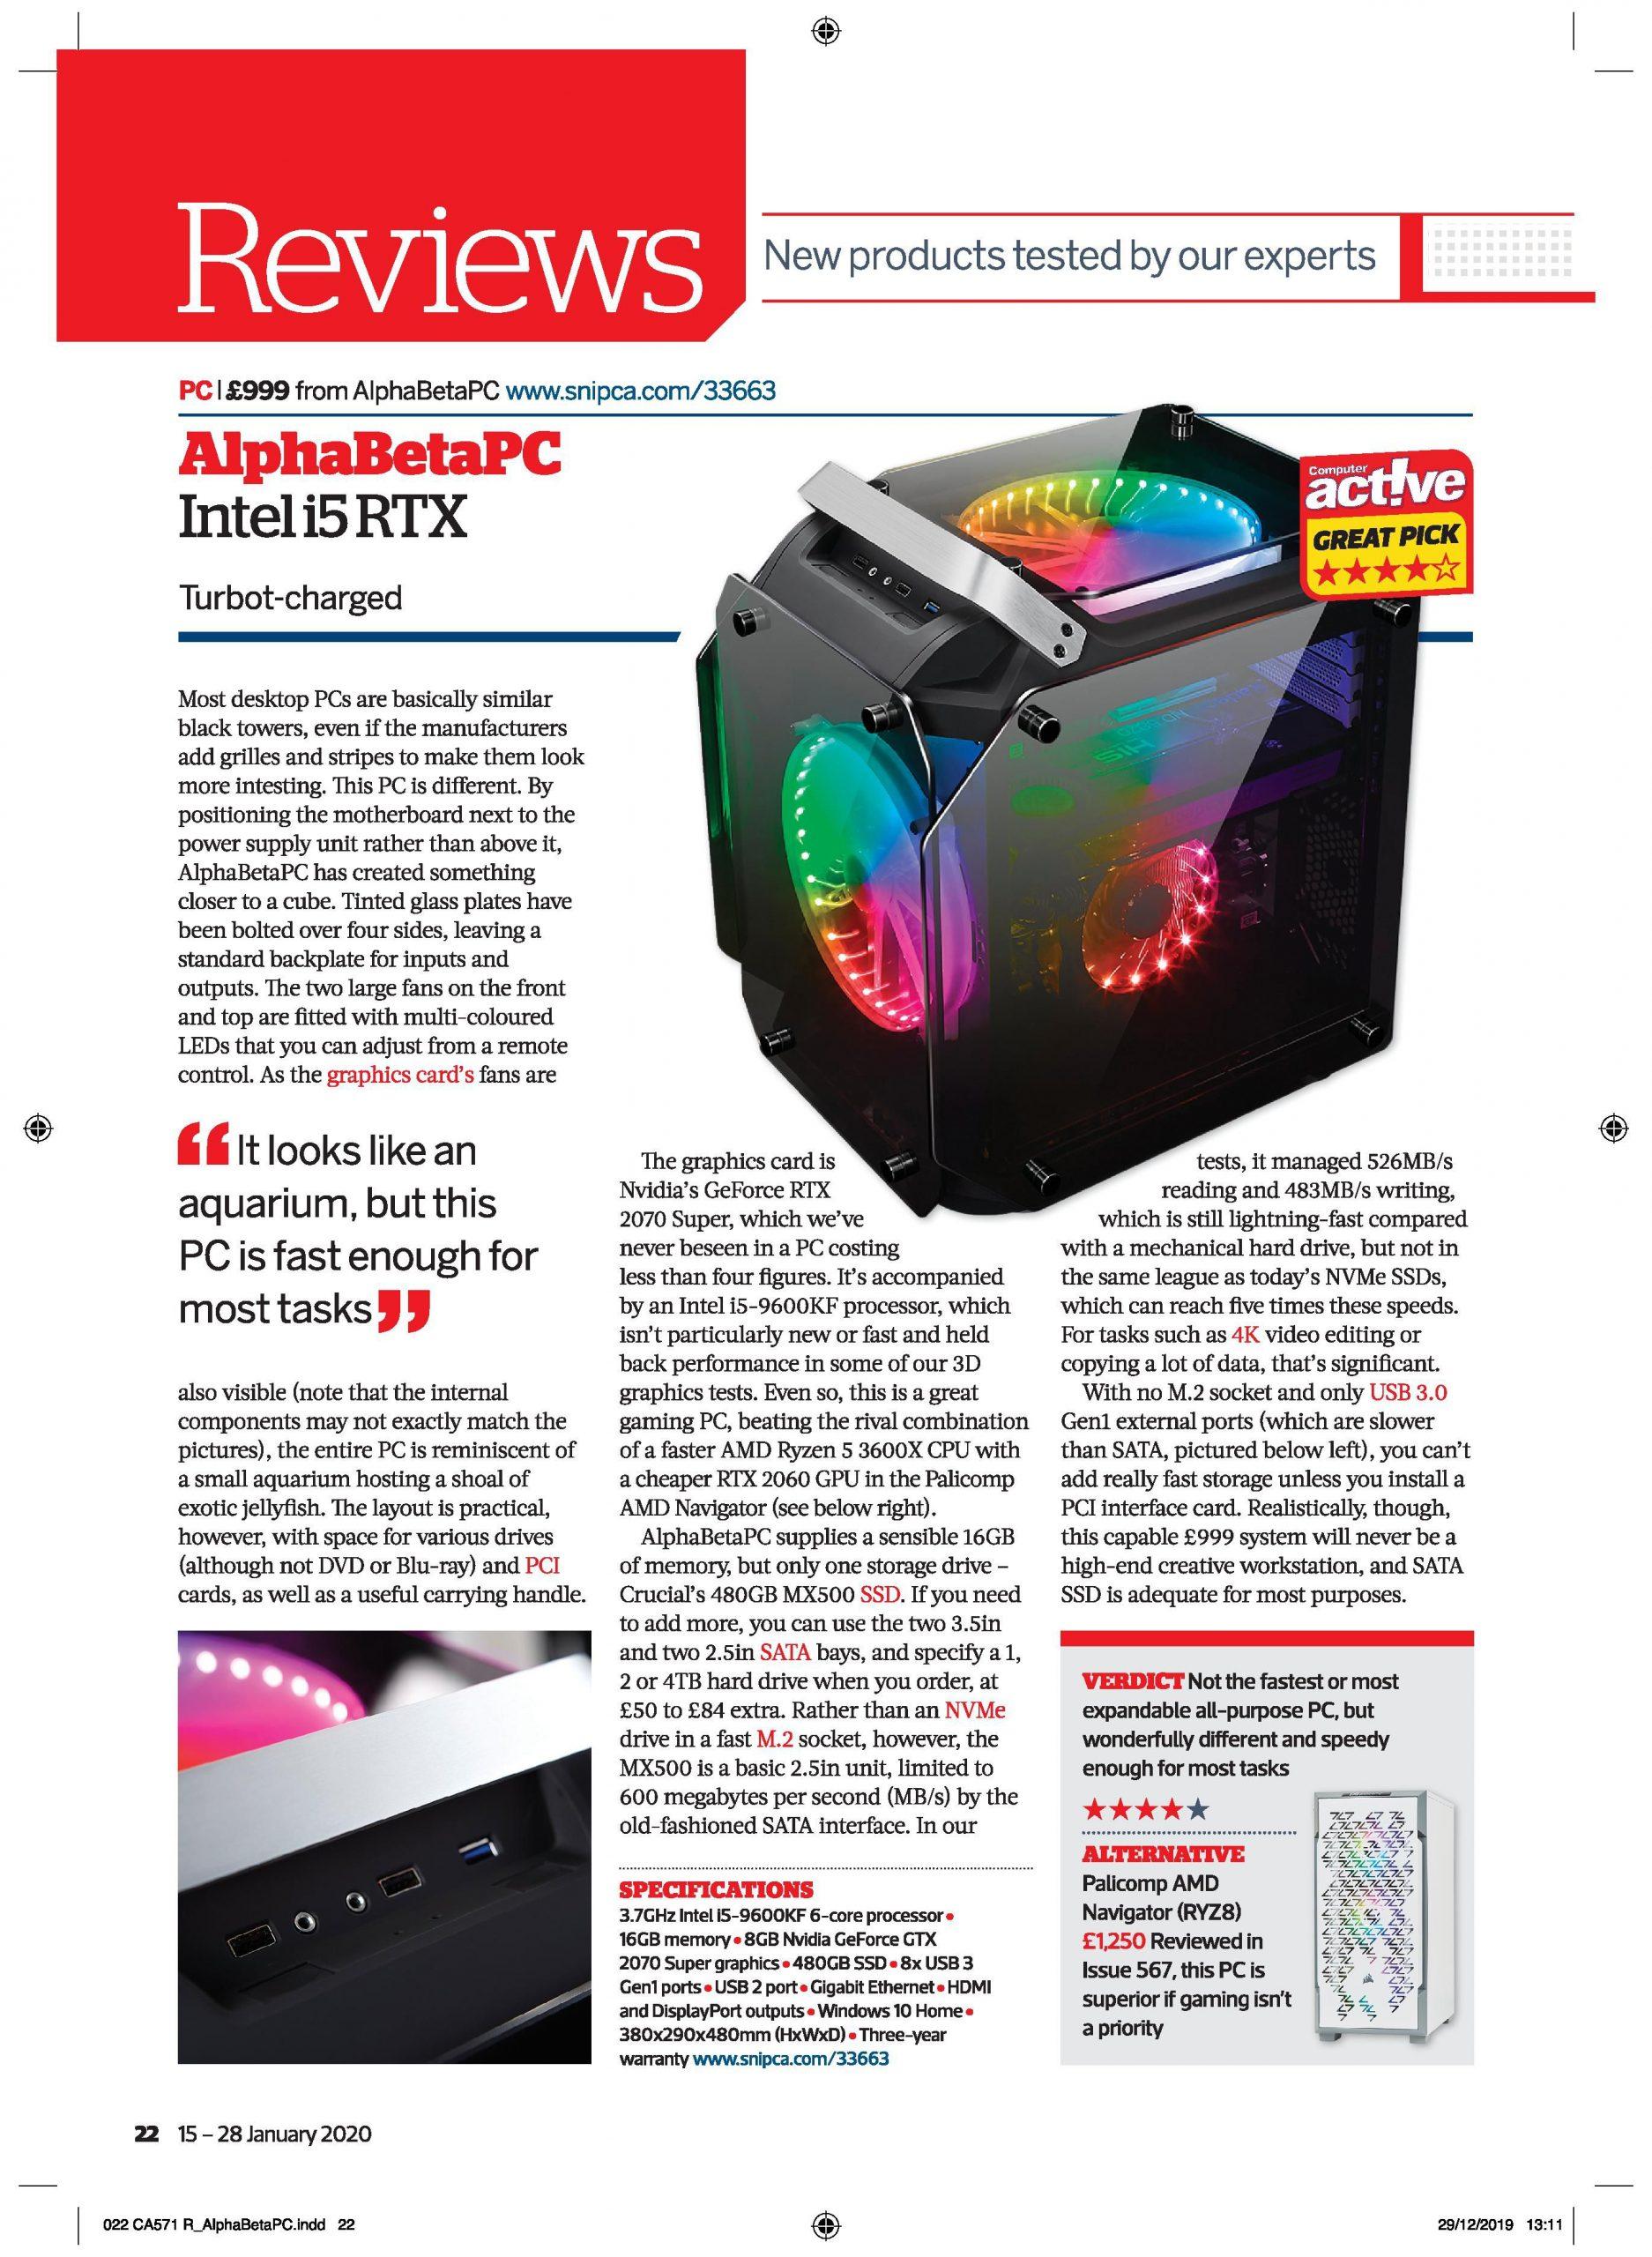 AlphabetaPC i5 RTX Computer Active Award Winning Gaming System